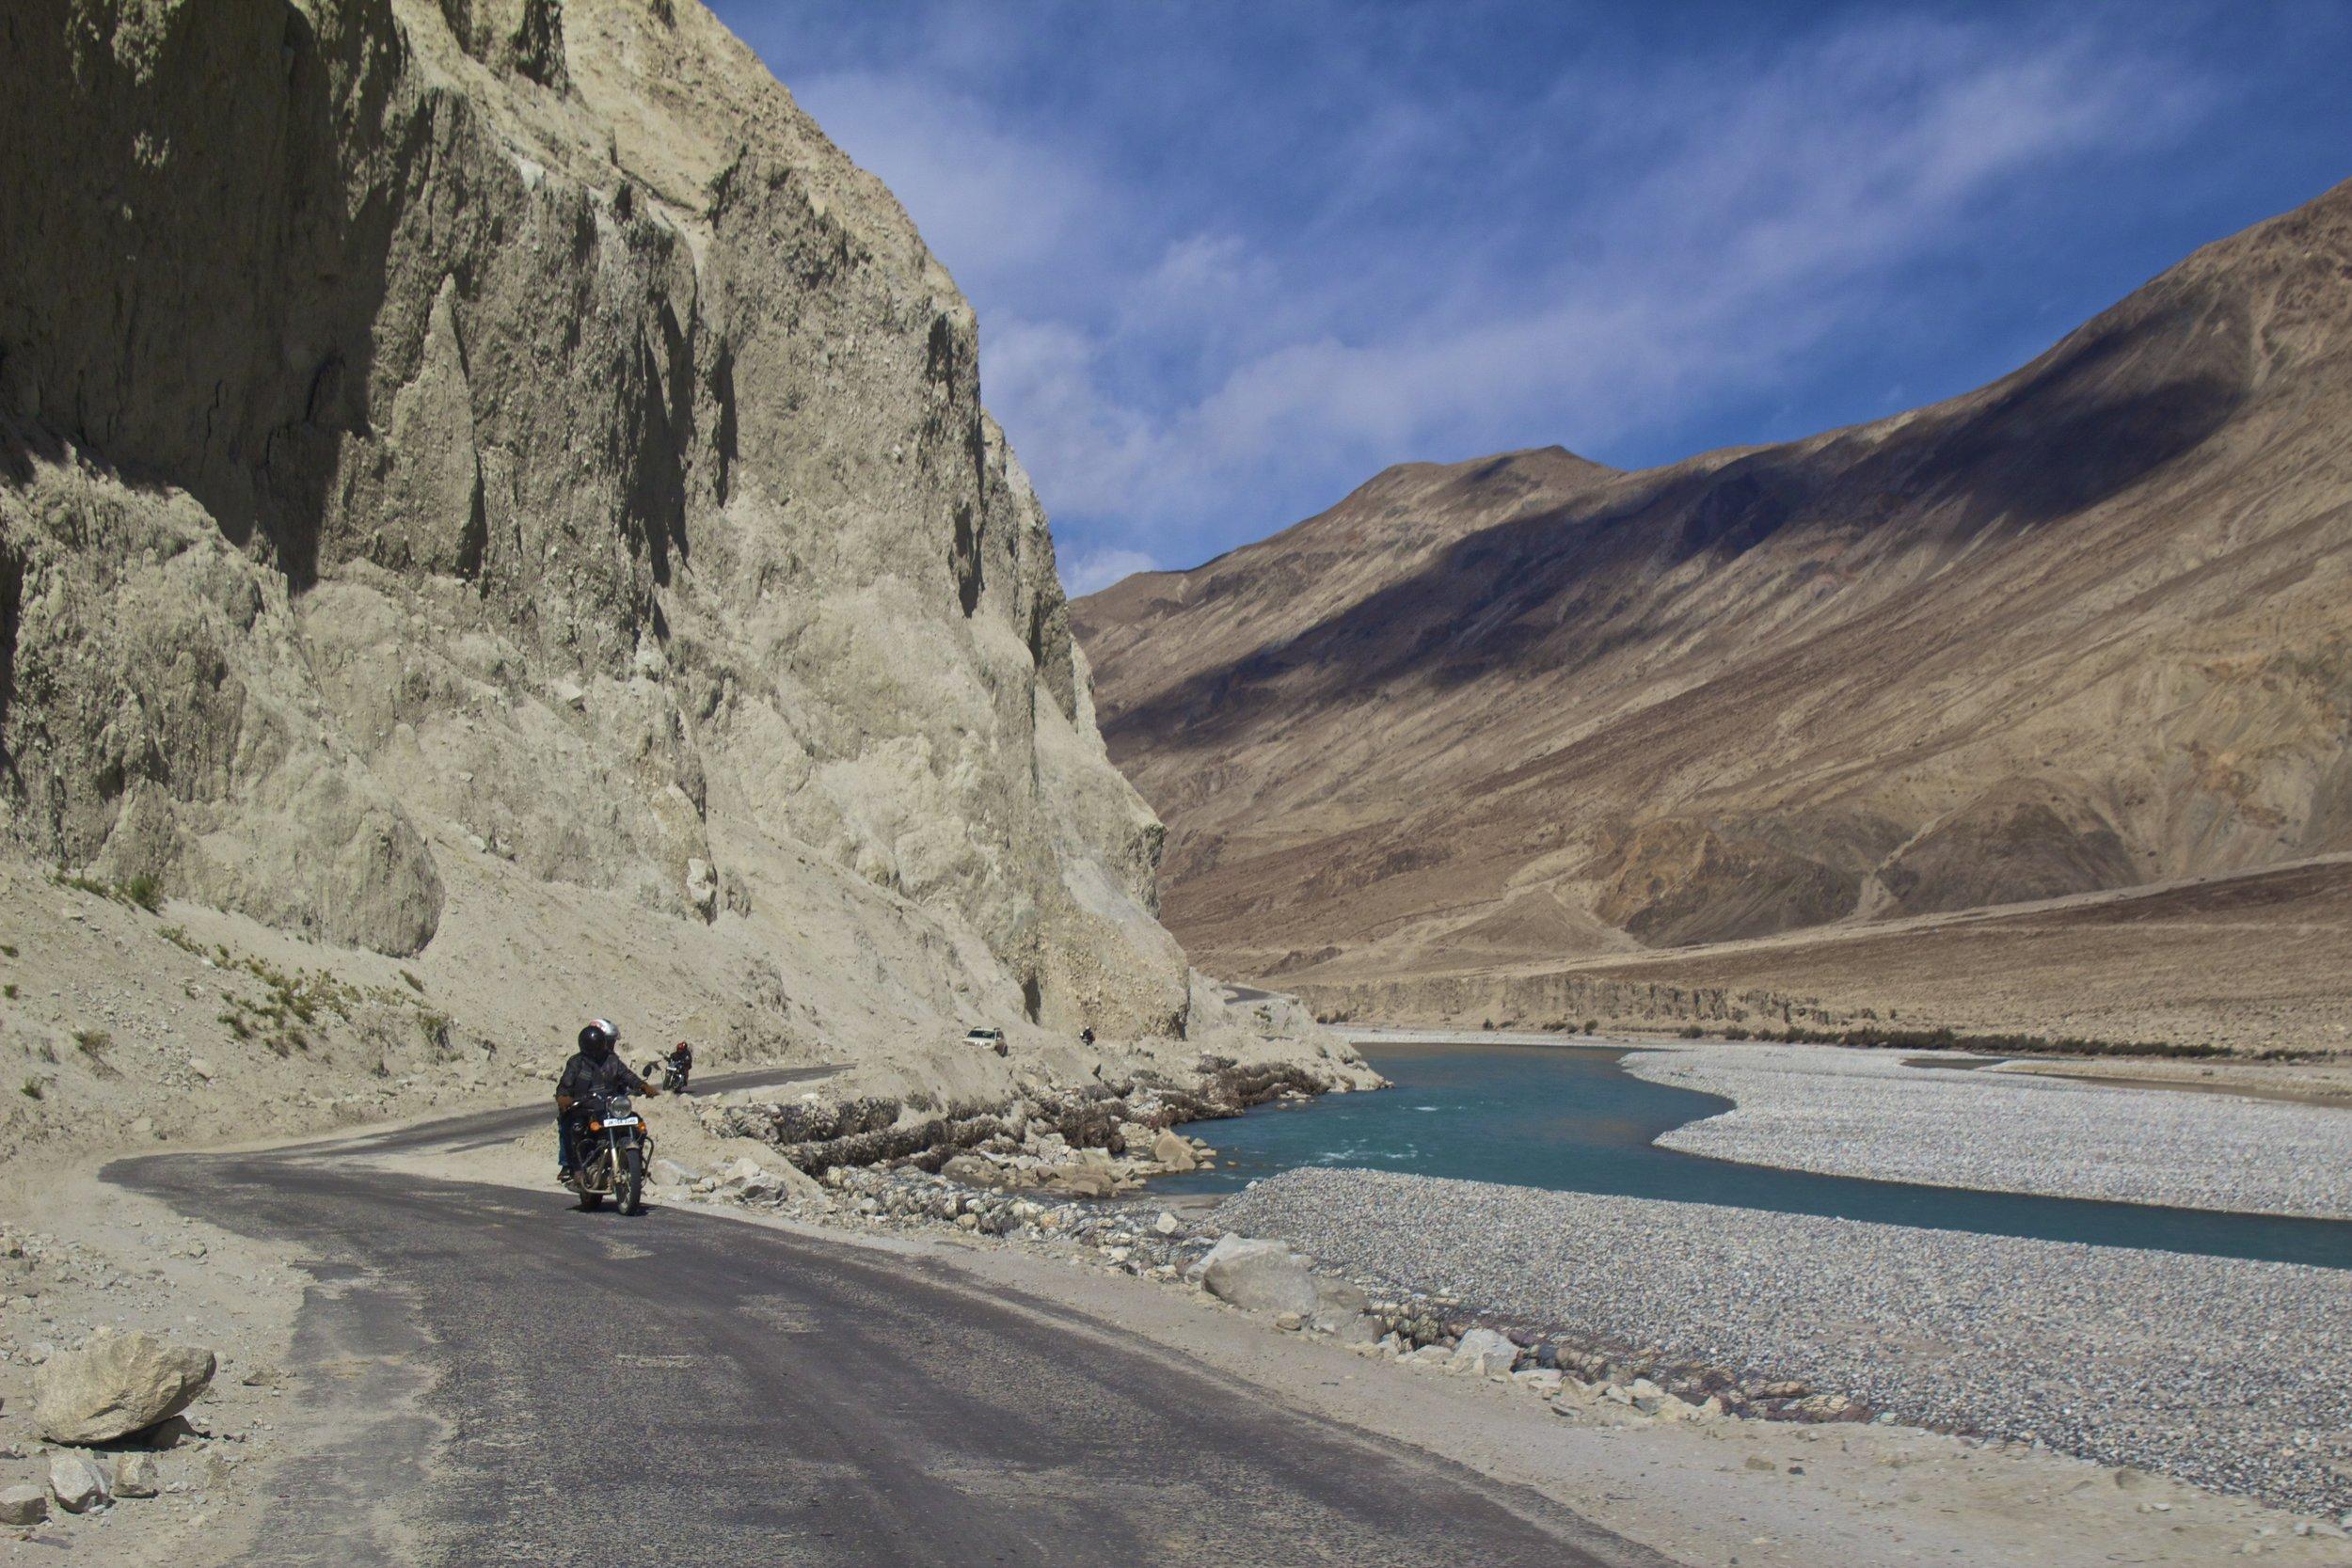 Shyok River Ladakh Gilgit Baltistan Indian Himalayas 3.jpg